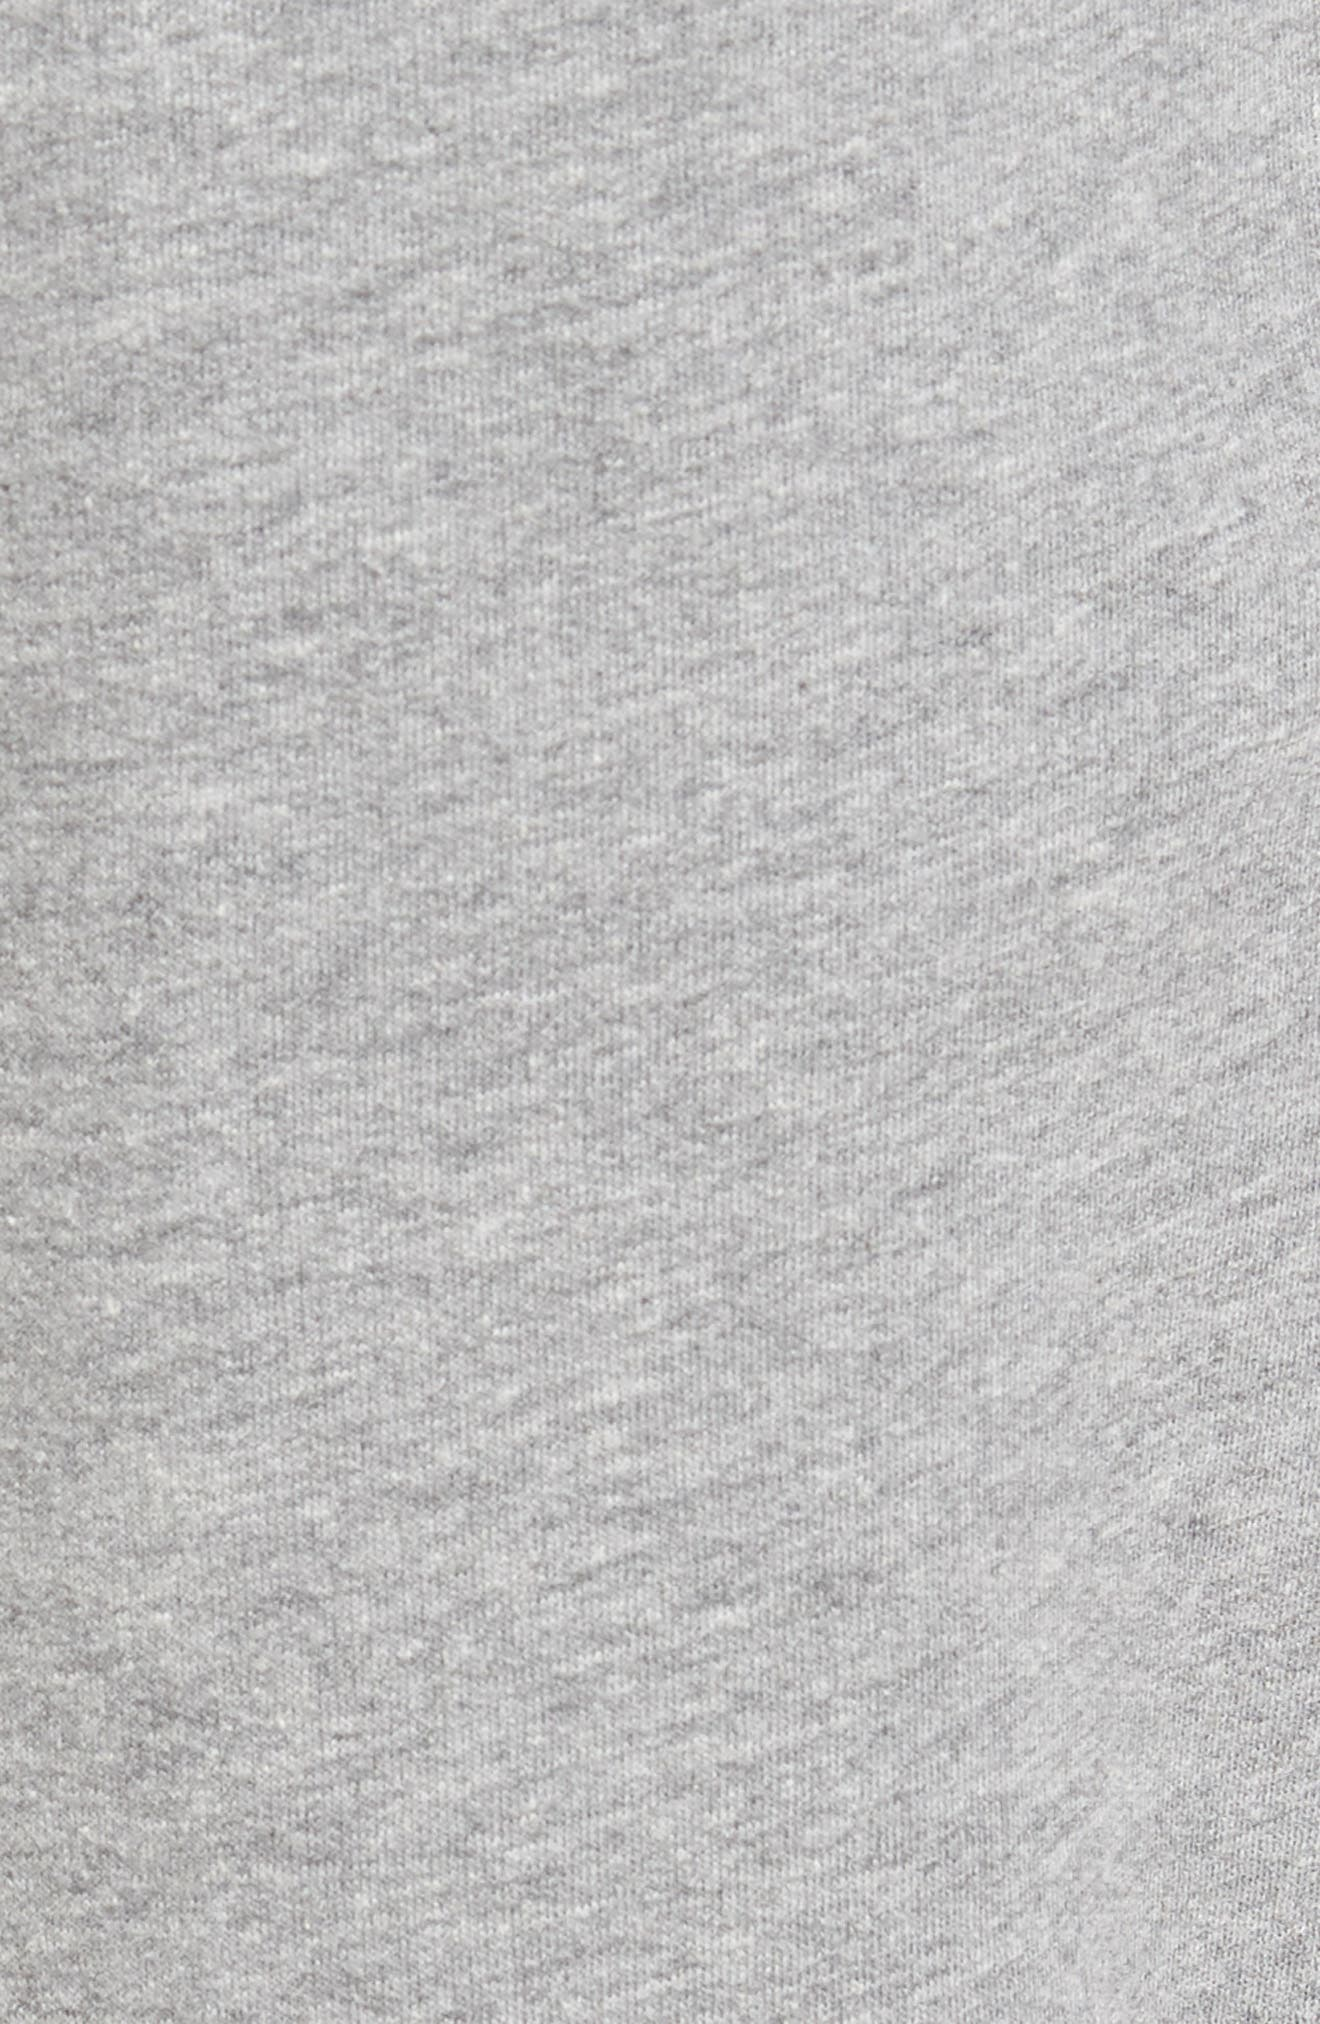 Jogger Lounge Pants,                             Alternate thumbnail 5, color,                             GREY HEATHER